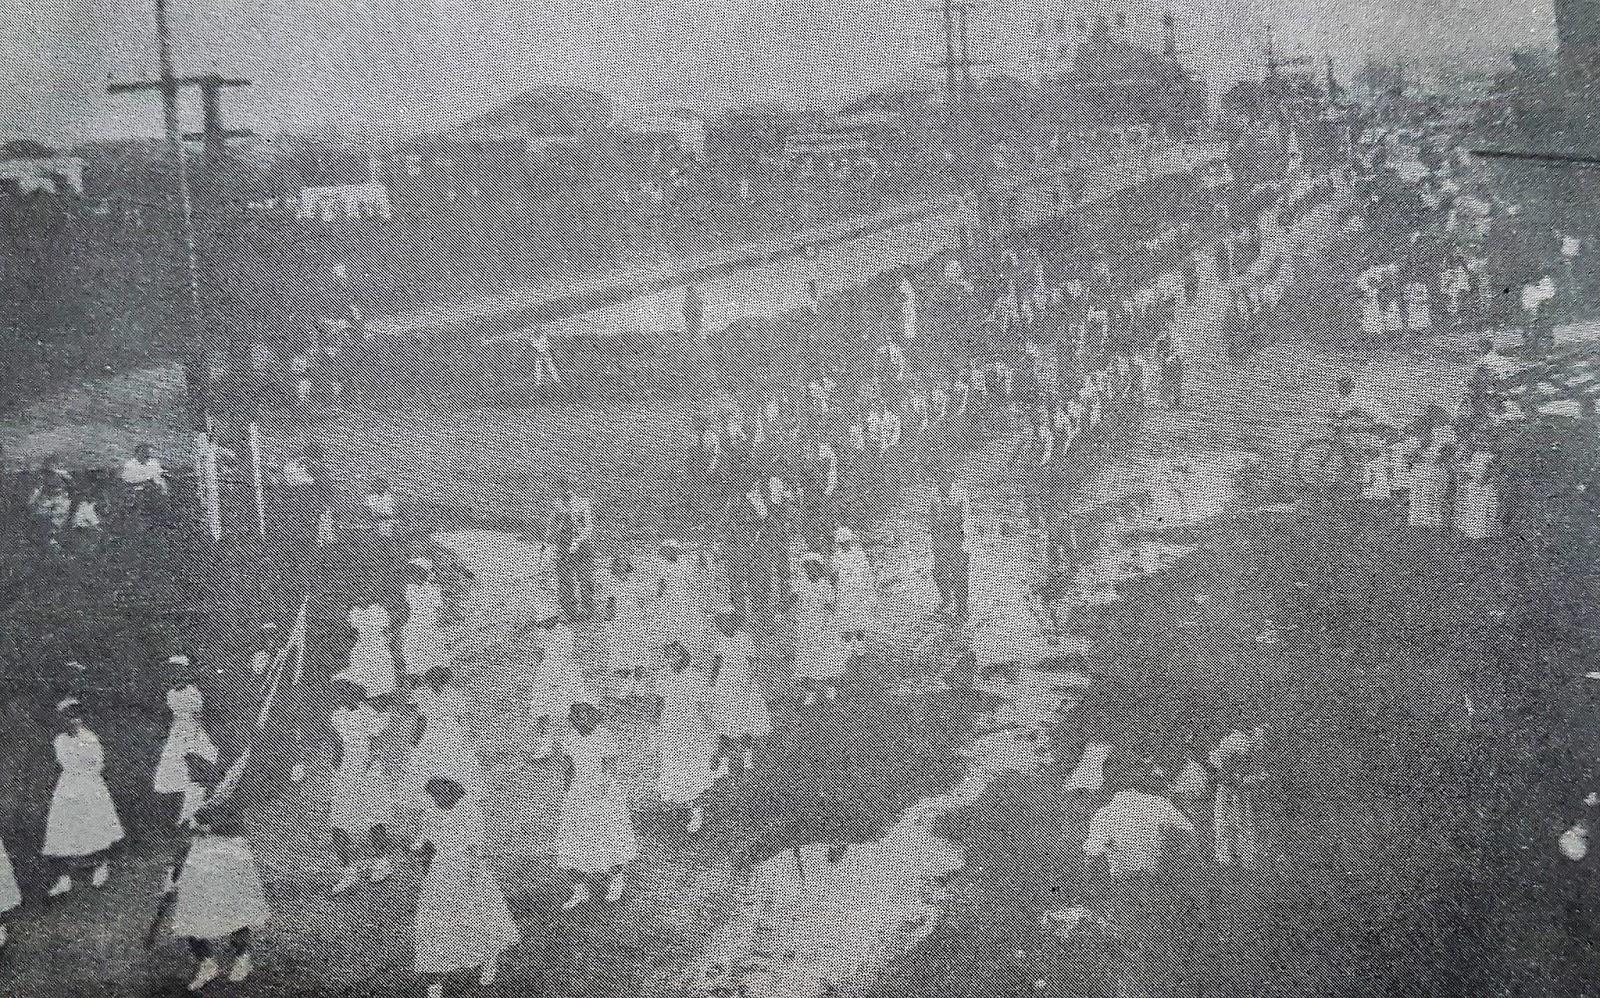 Aniversário de Maringá - 1953